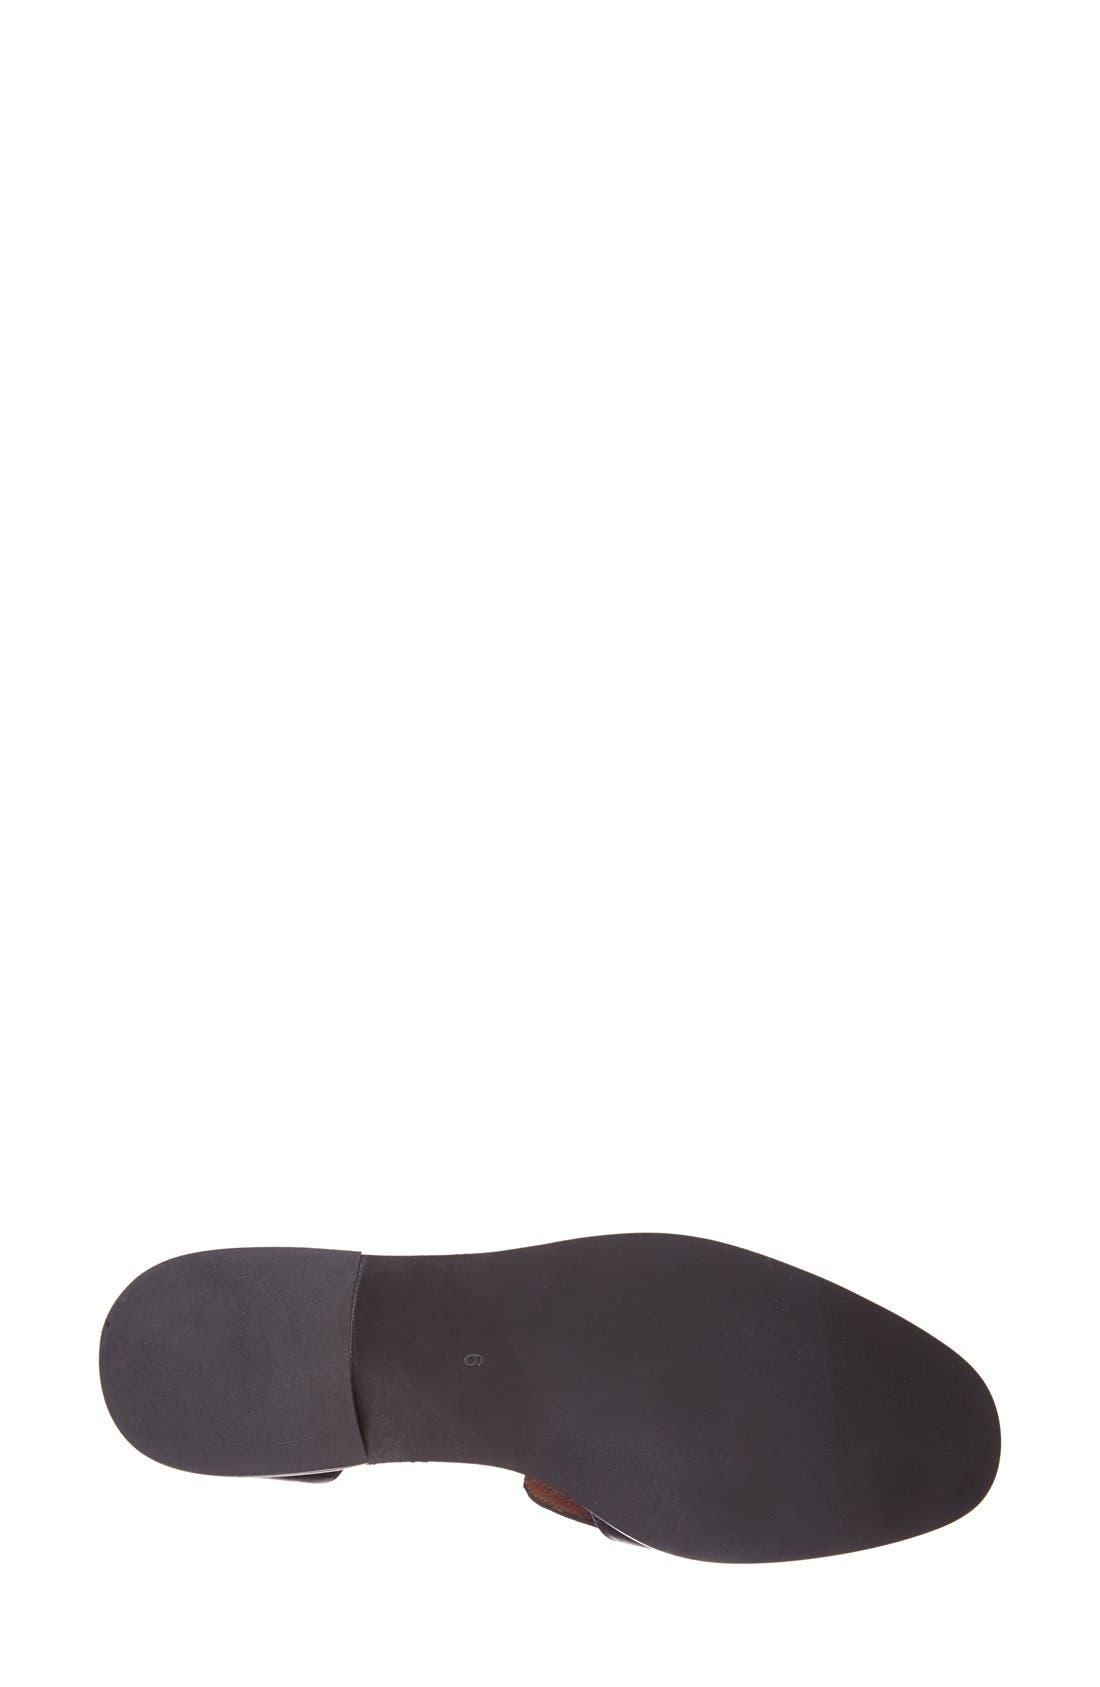 JEFFREY CAMPBELL, 'Open Case' Tasseled Leather Flat, Alternate thumbnail 2, color, 001